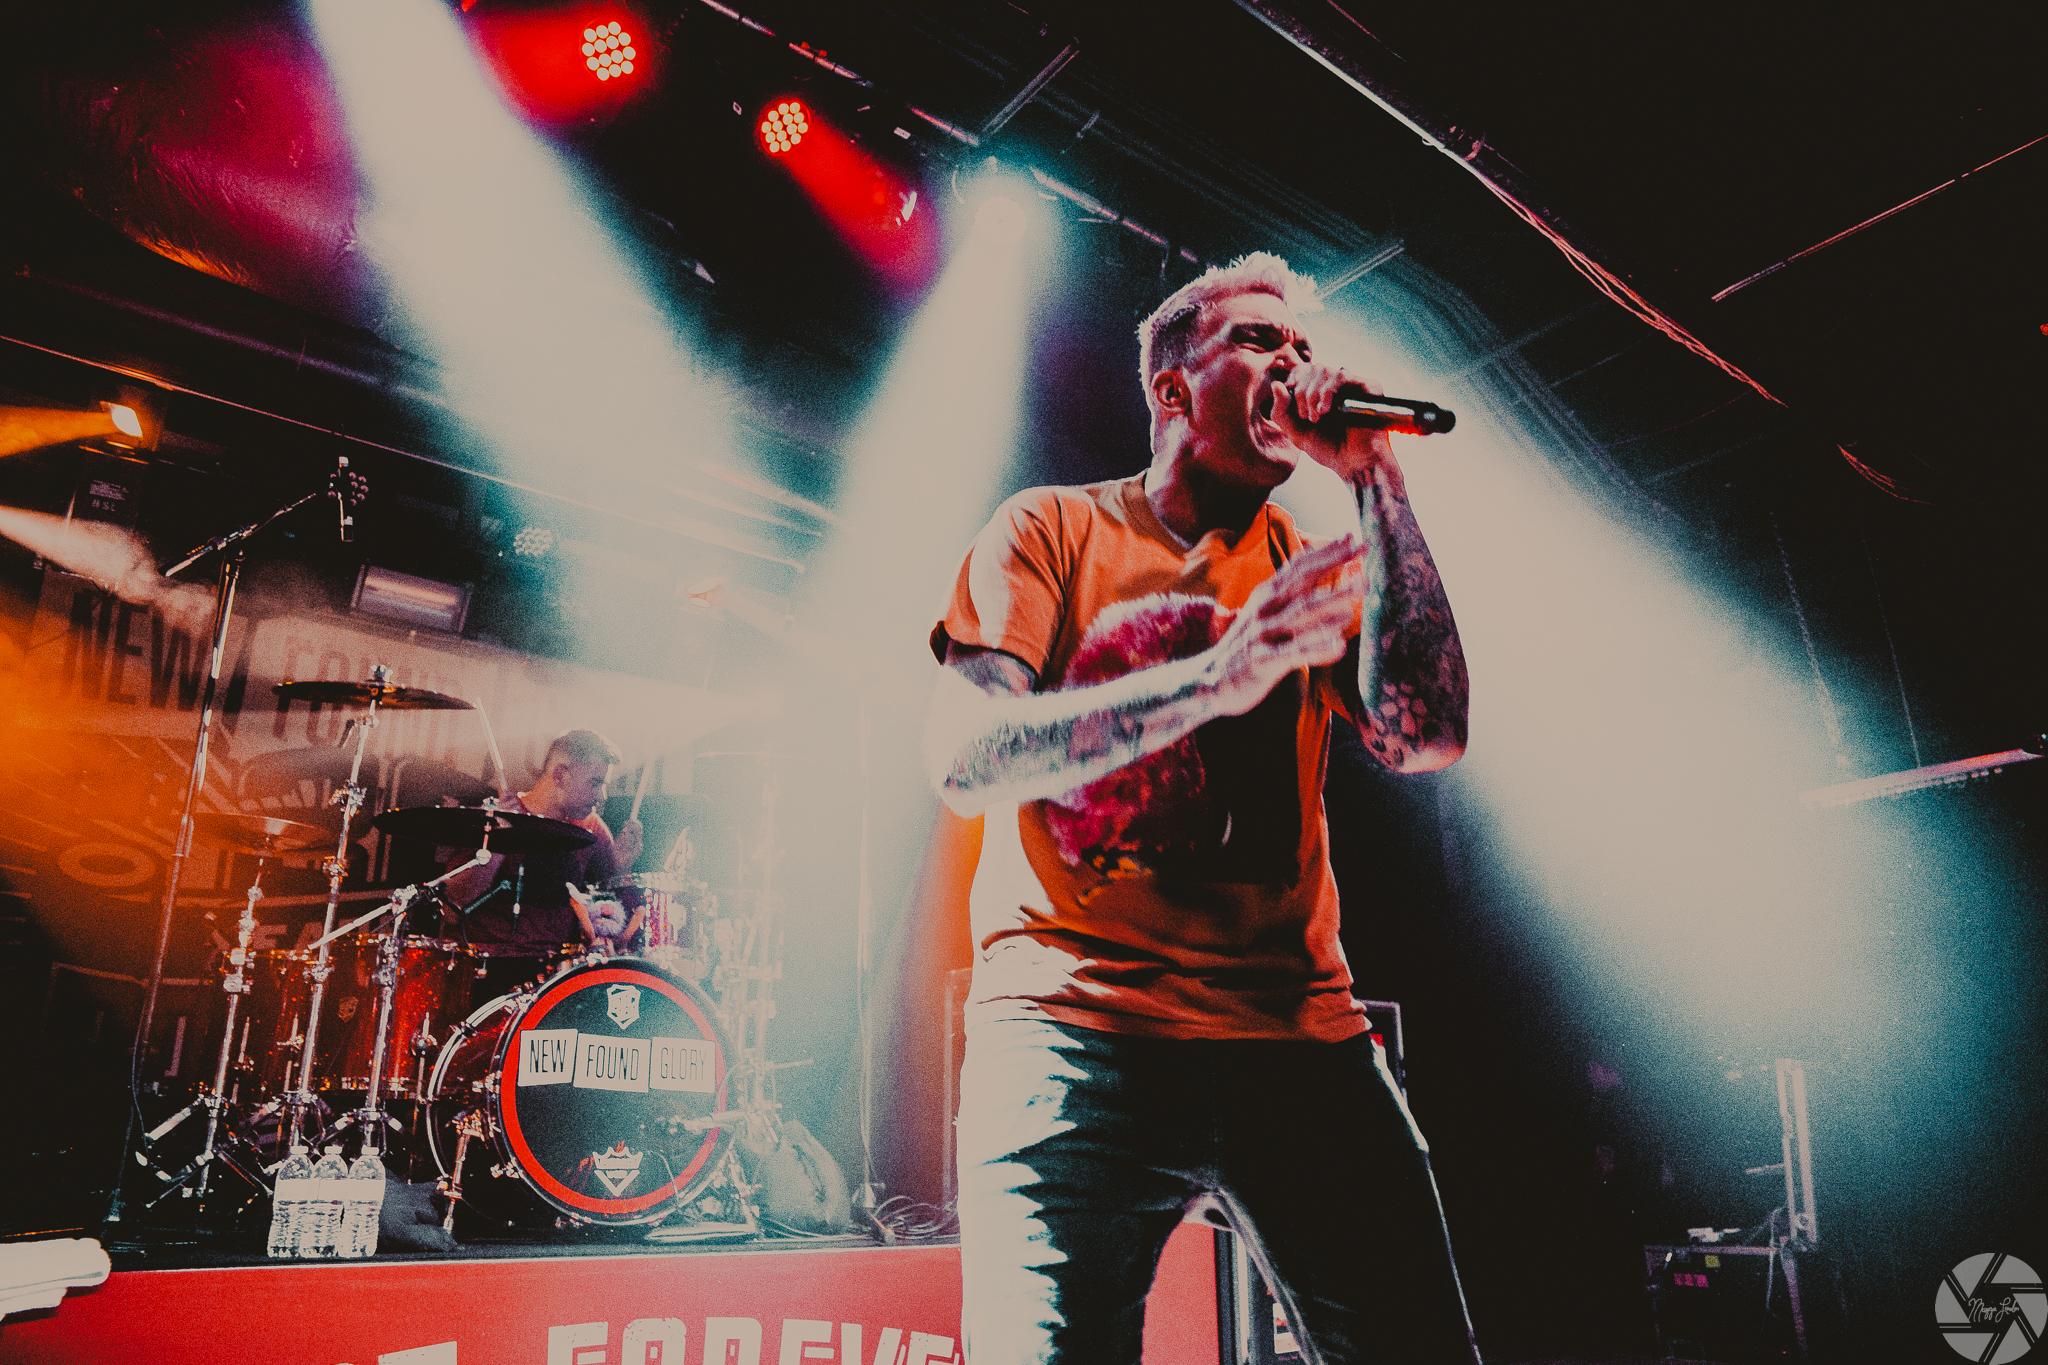 New Found Glory (3 of 22).jpg